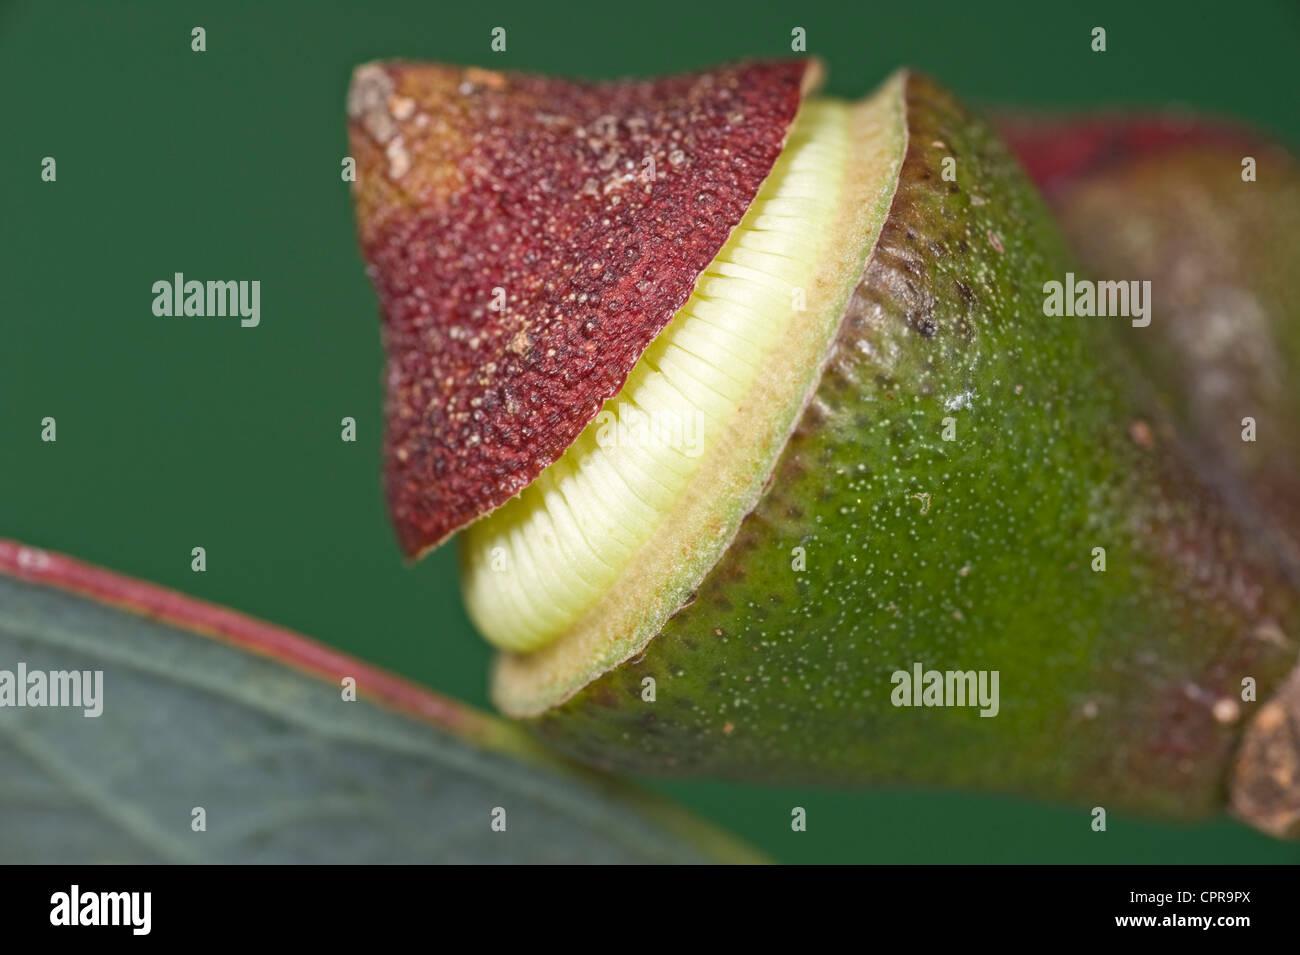 Apertura de la flor de eucalipto amarillo Imagen De Stock